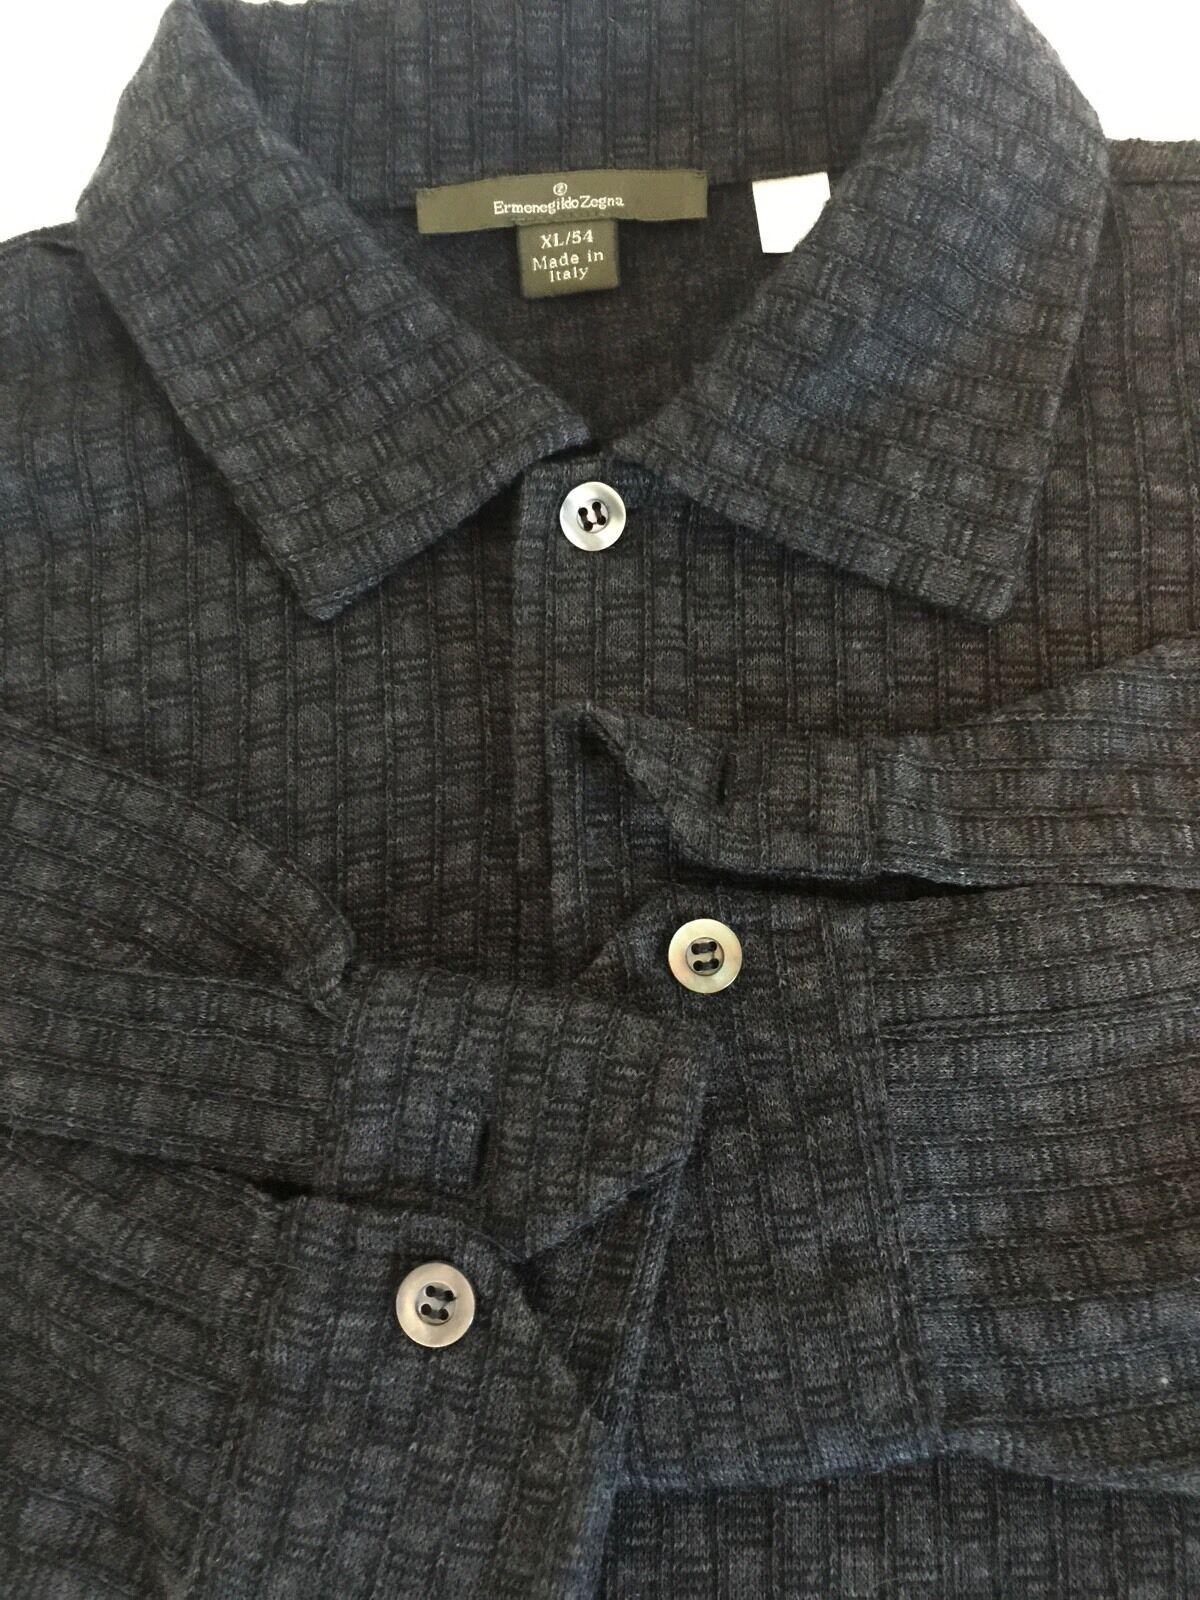 Ermenegildo Zegna Sweater grau Größe XL/54